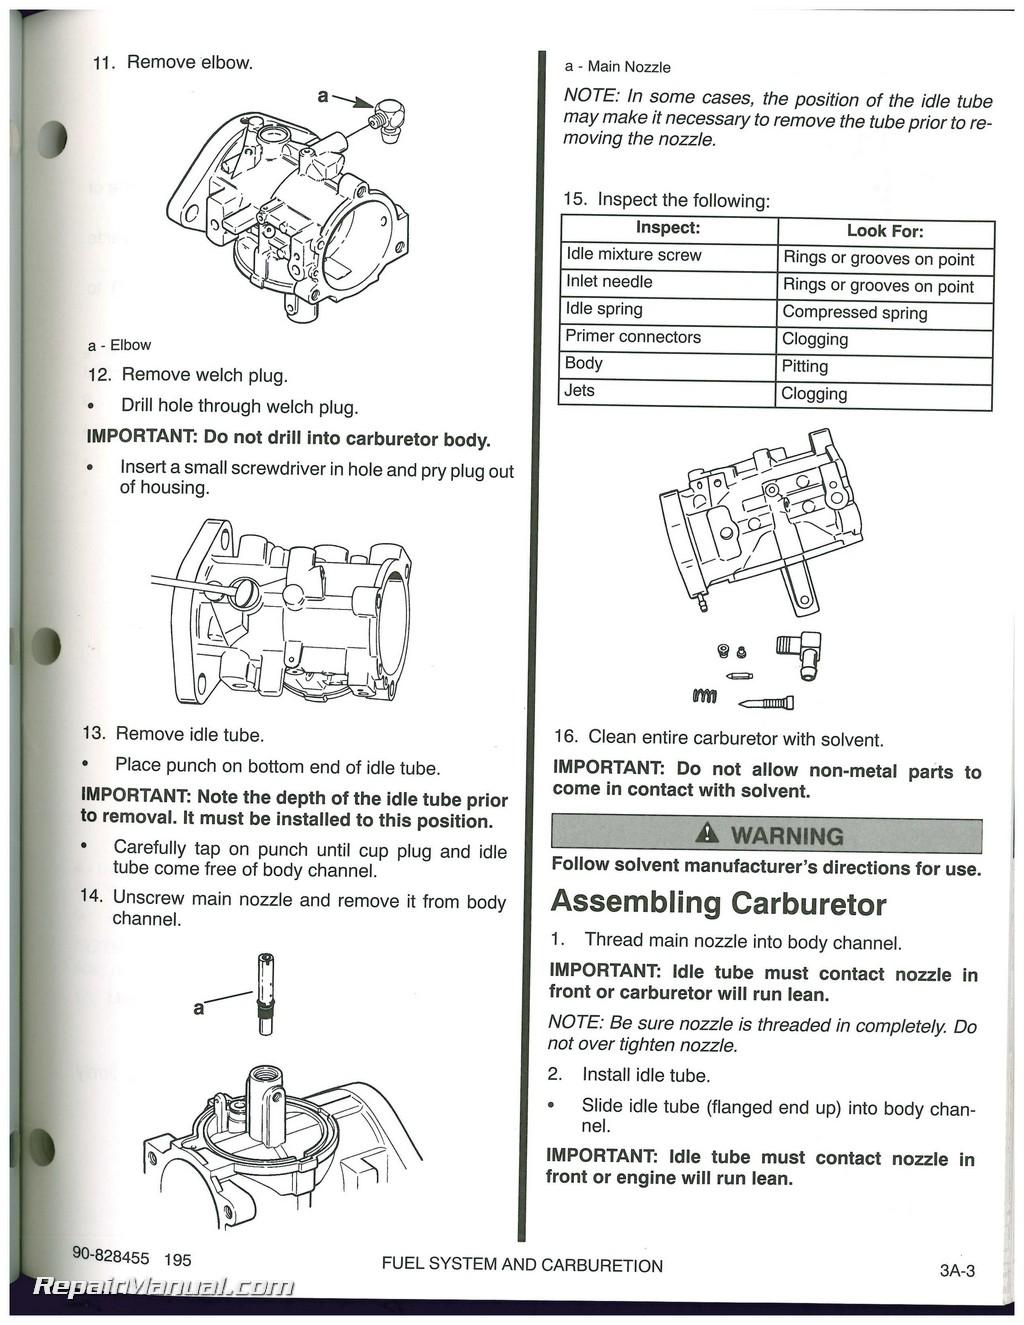 Used 1995 Mercury 90  120 Sport Jet Engine Service Manual